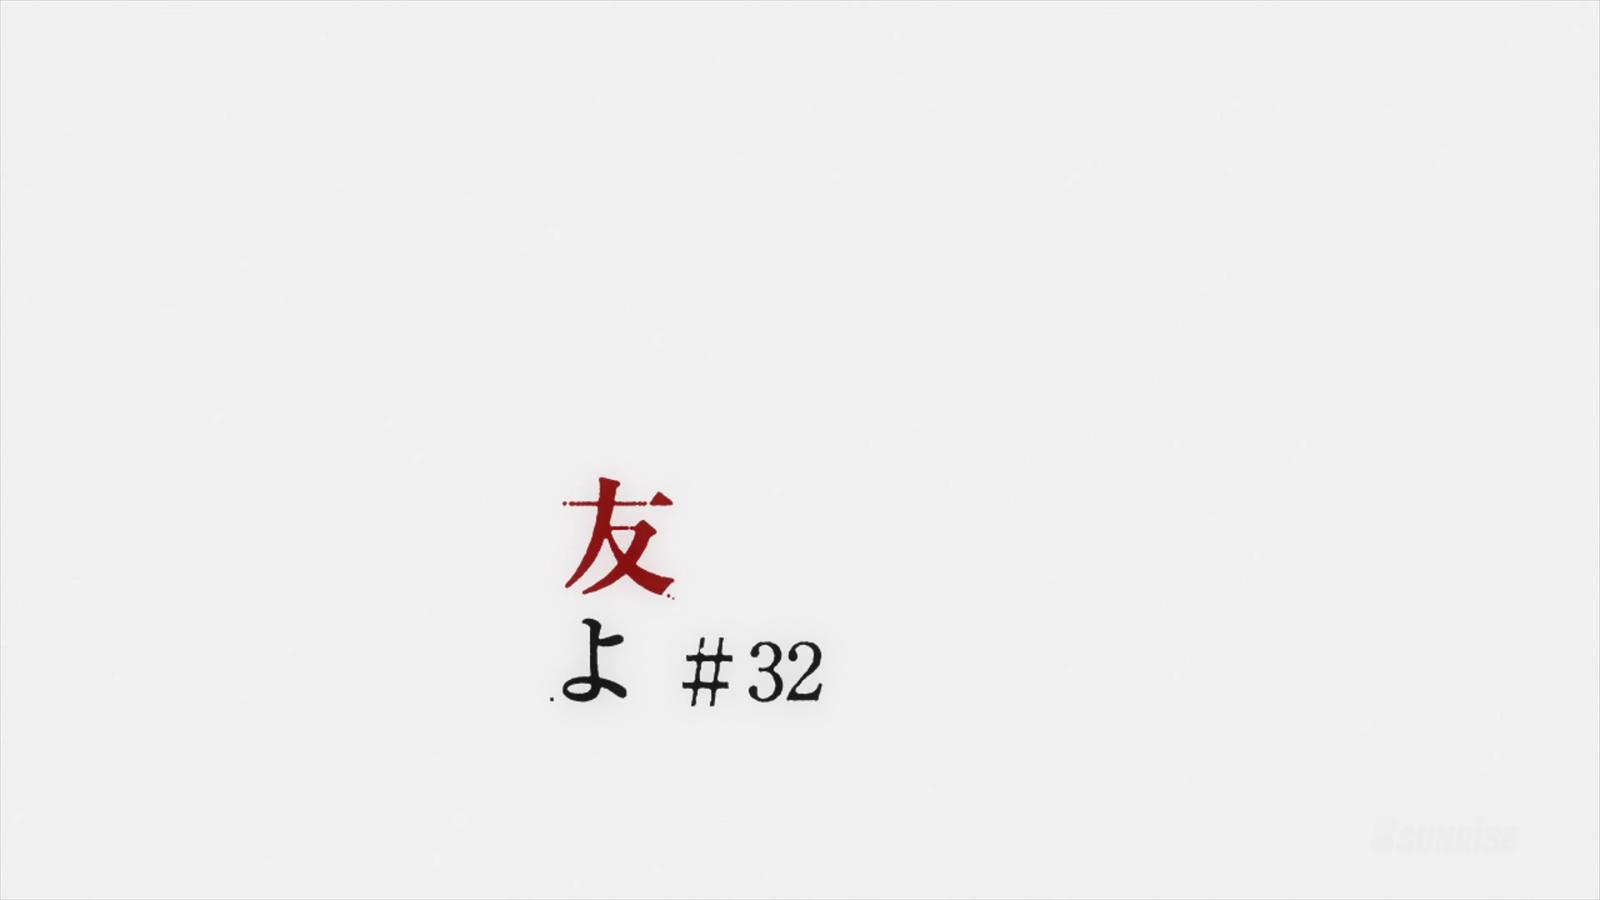 「Mobile Suit Gundam 友よ」的圖片搜尋結果